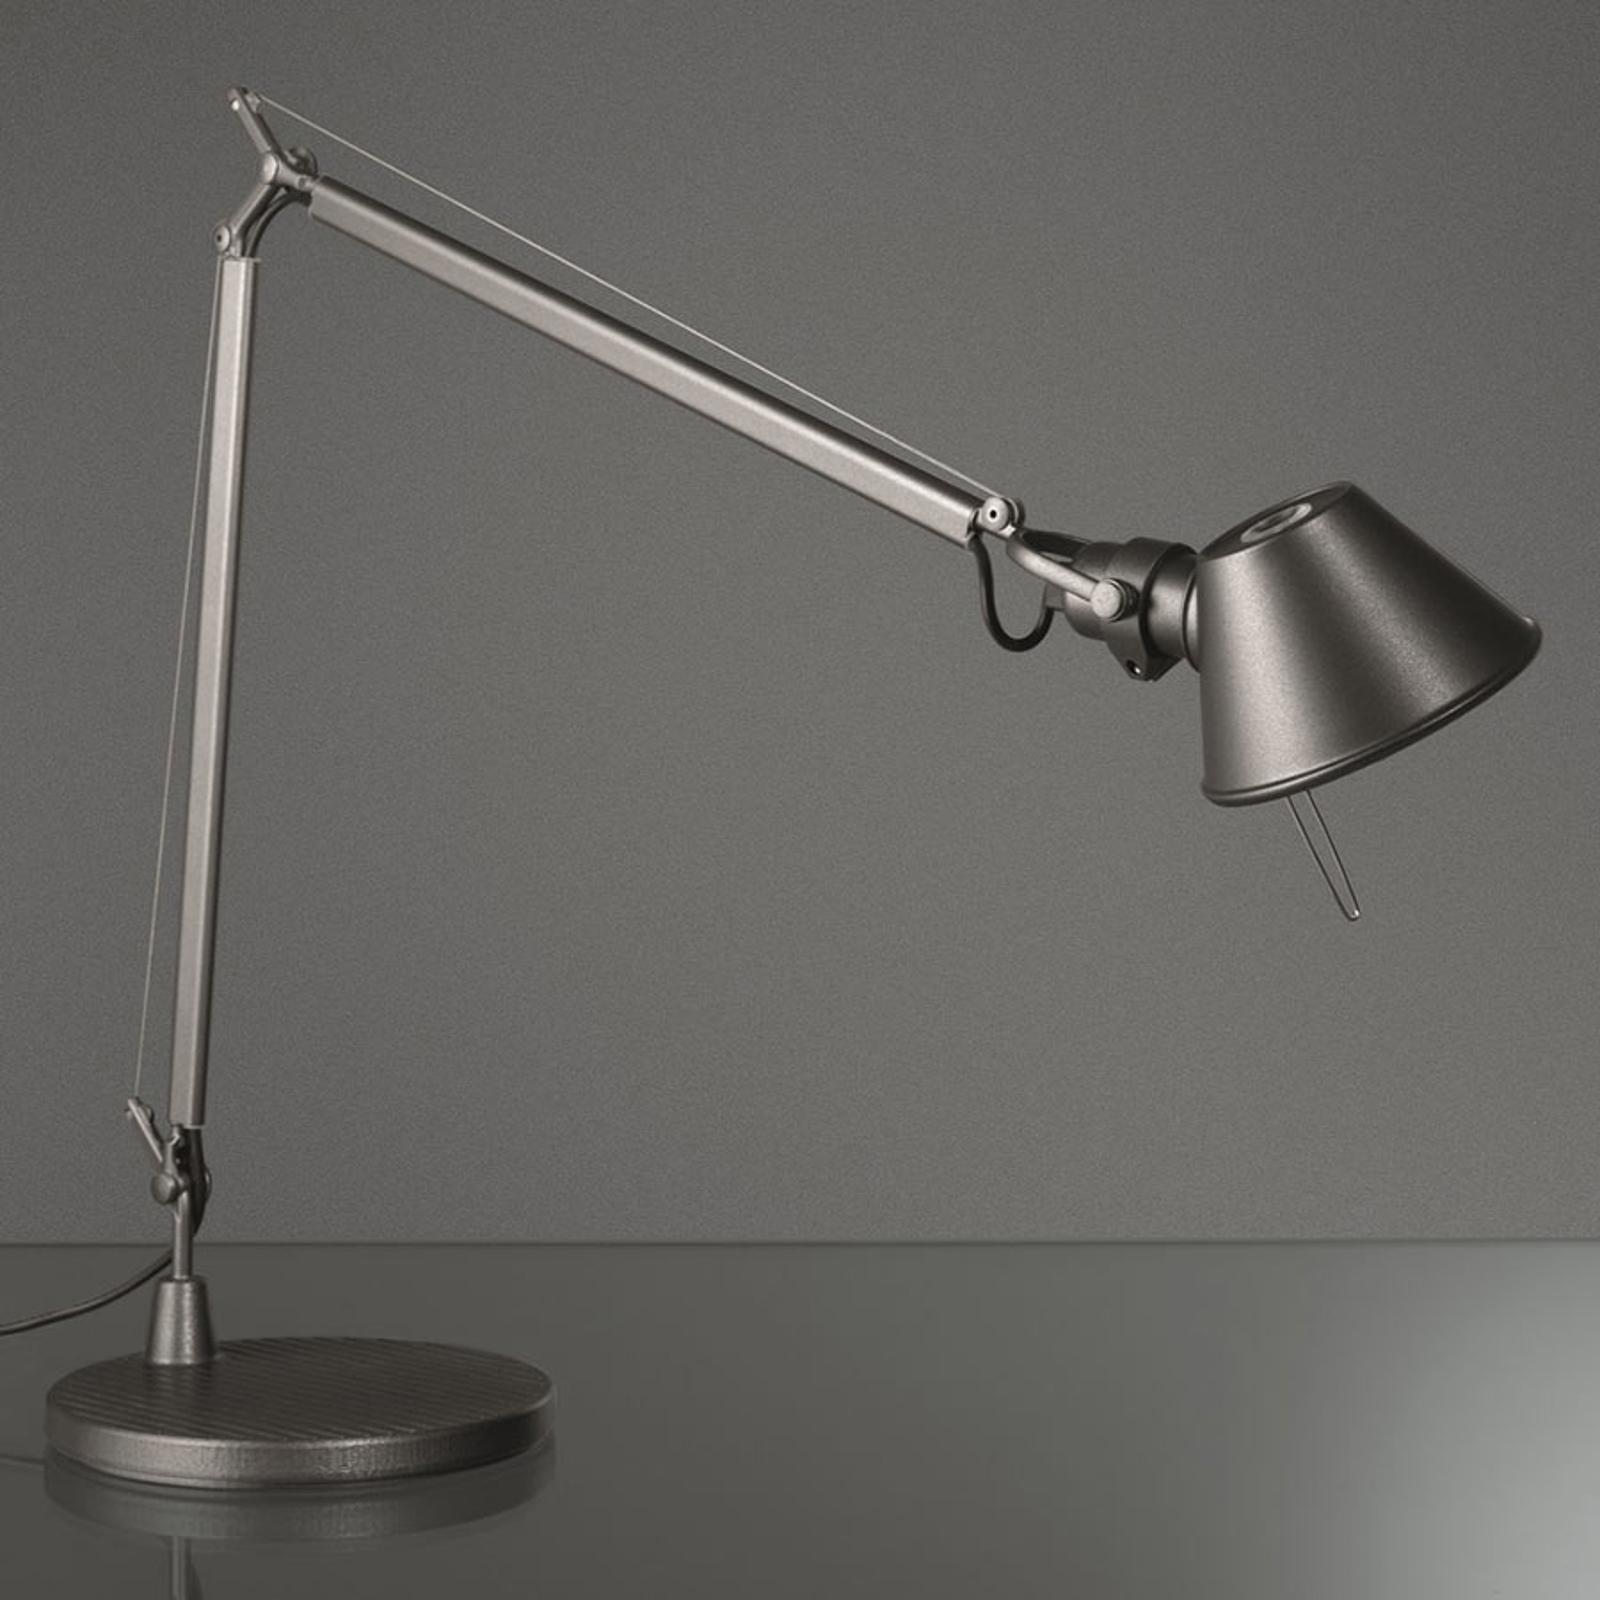 Artemide Tolomeo Midi lampe LED 3 000K gris